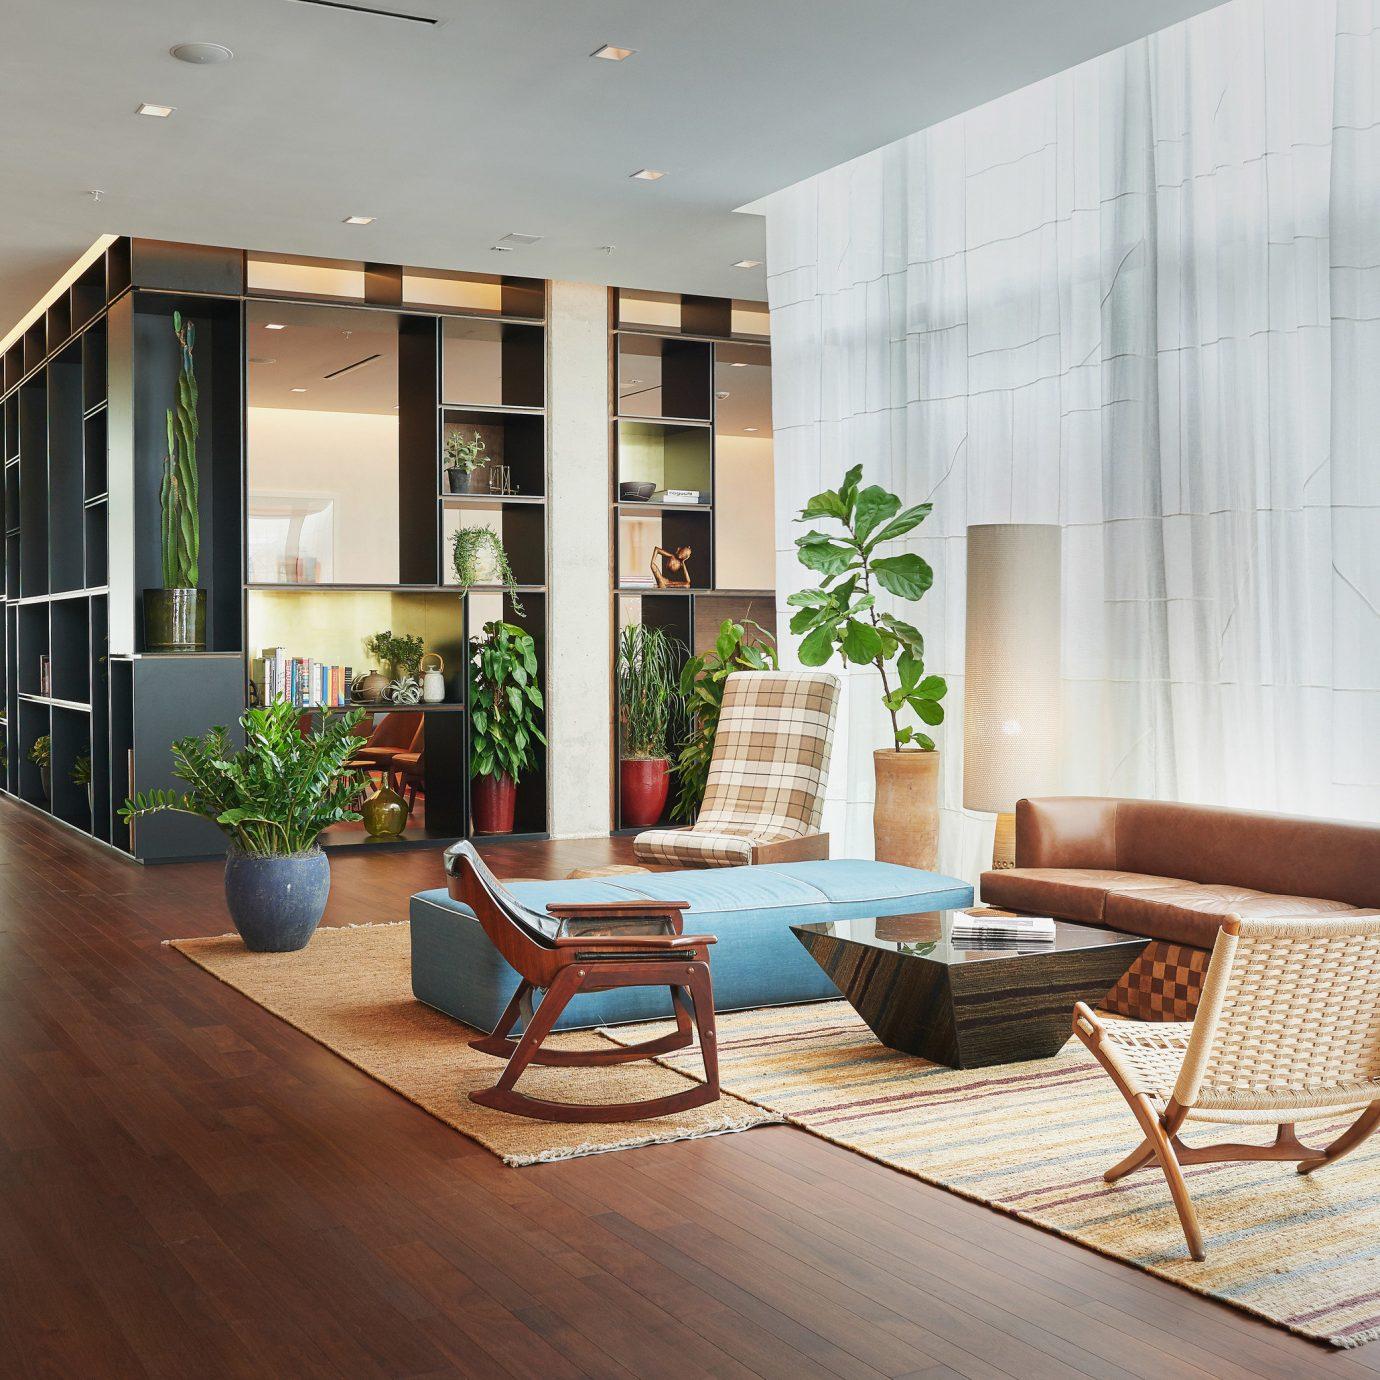 property building living room house home hardwood condominium lighting Lobby flooring professional wood flooring